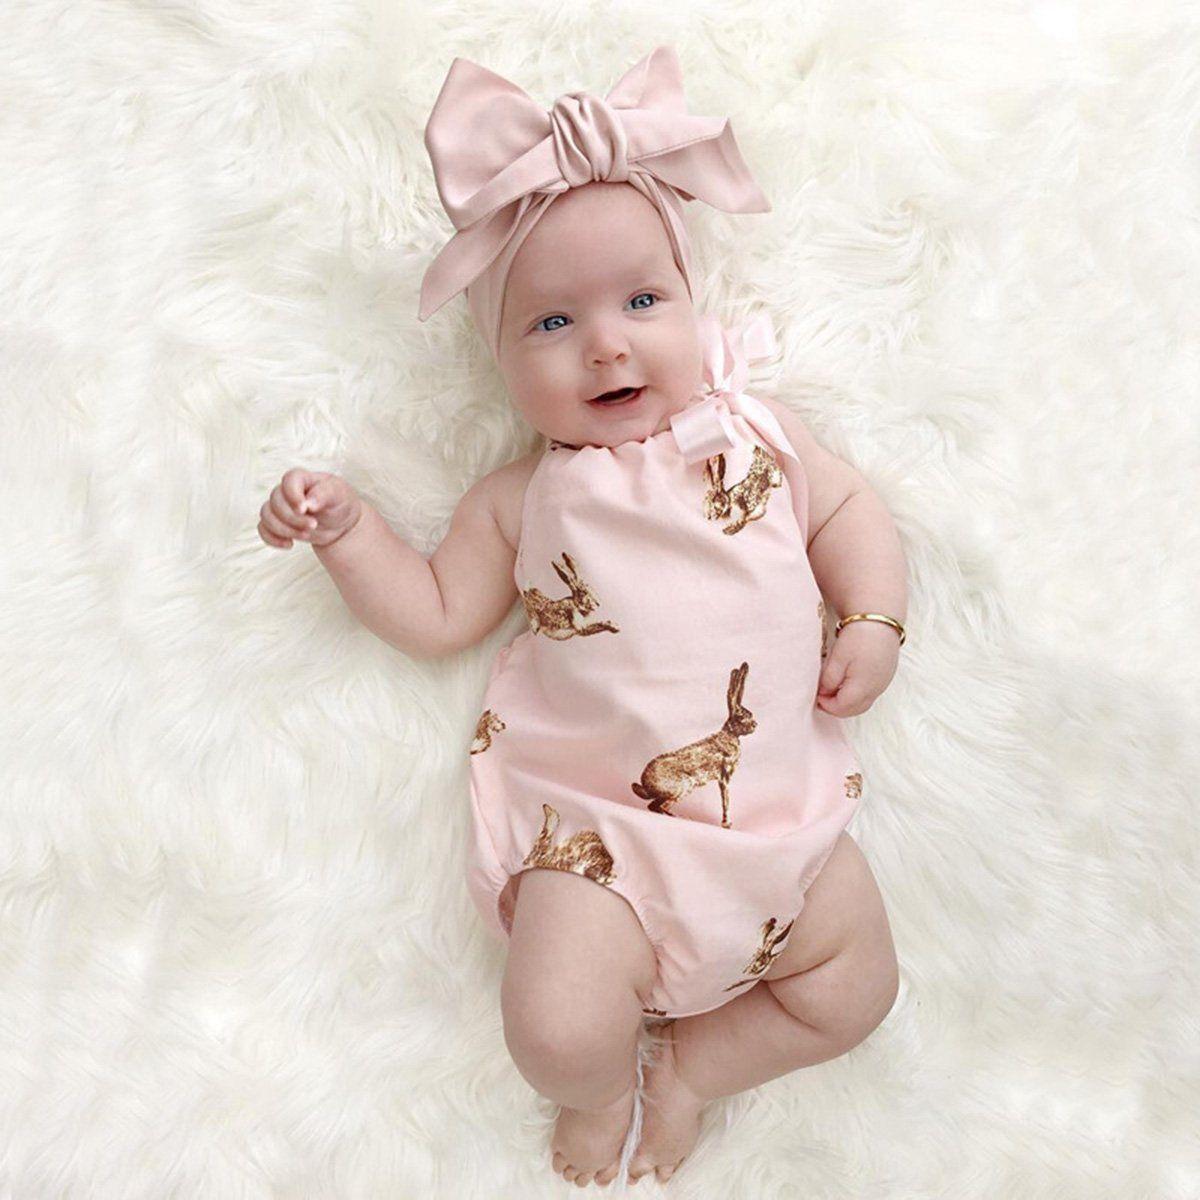 Newborn Baby Girl Clothes Romper Jumpsuit Bodysuit Headband Outfit Set 2PCS